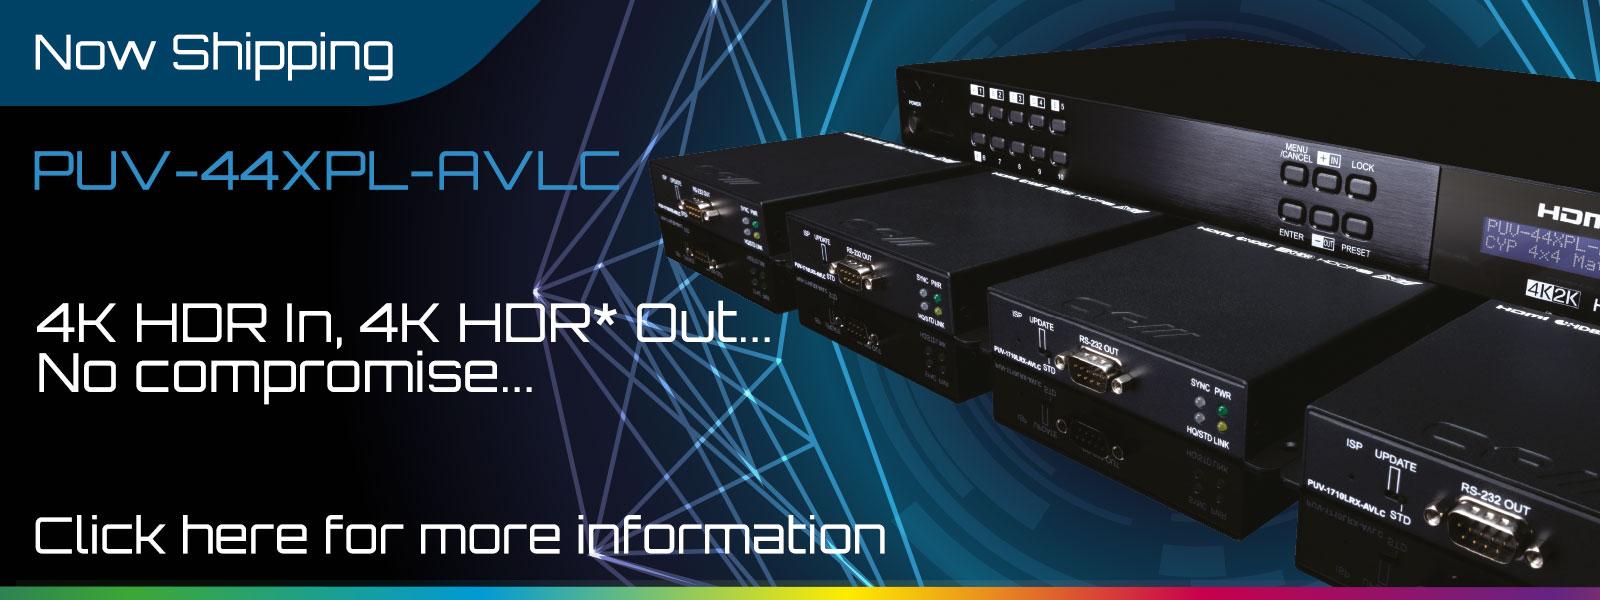 puv-44xpl-kit-banner-1600x600px